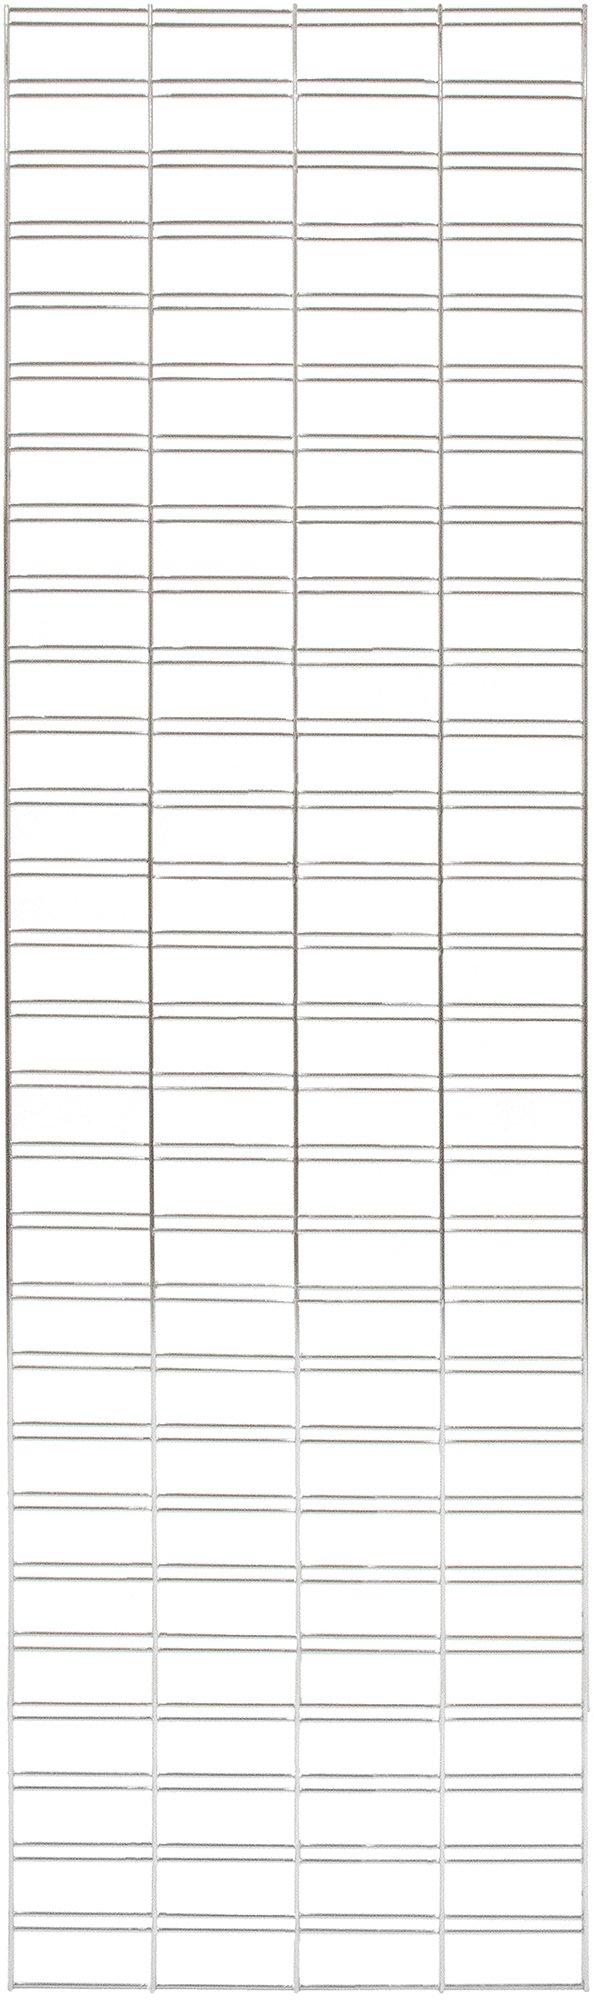 KC Store Fixtures A04257 Slatgrid Panel, 2' x 8', Chrome (Pack of 3)